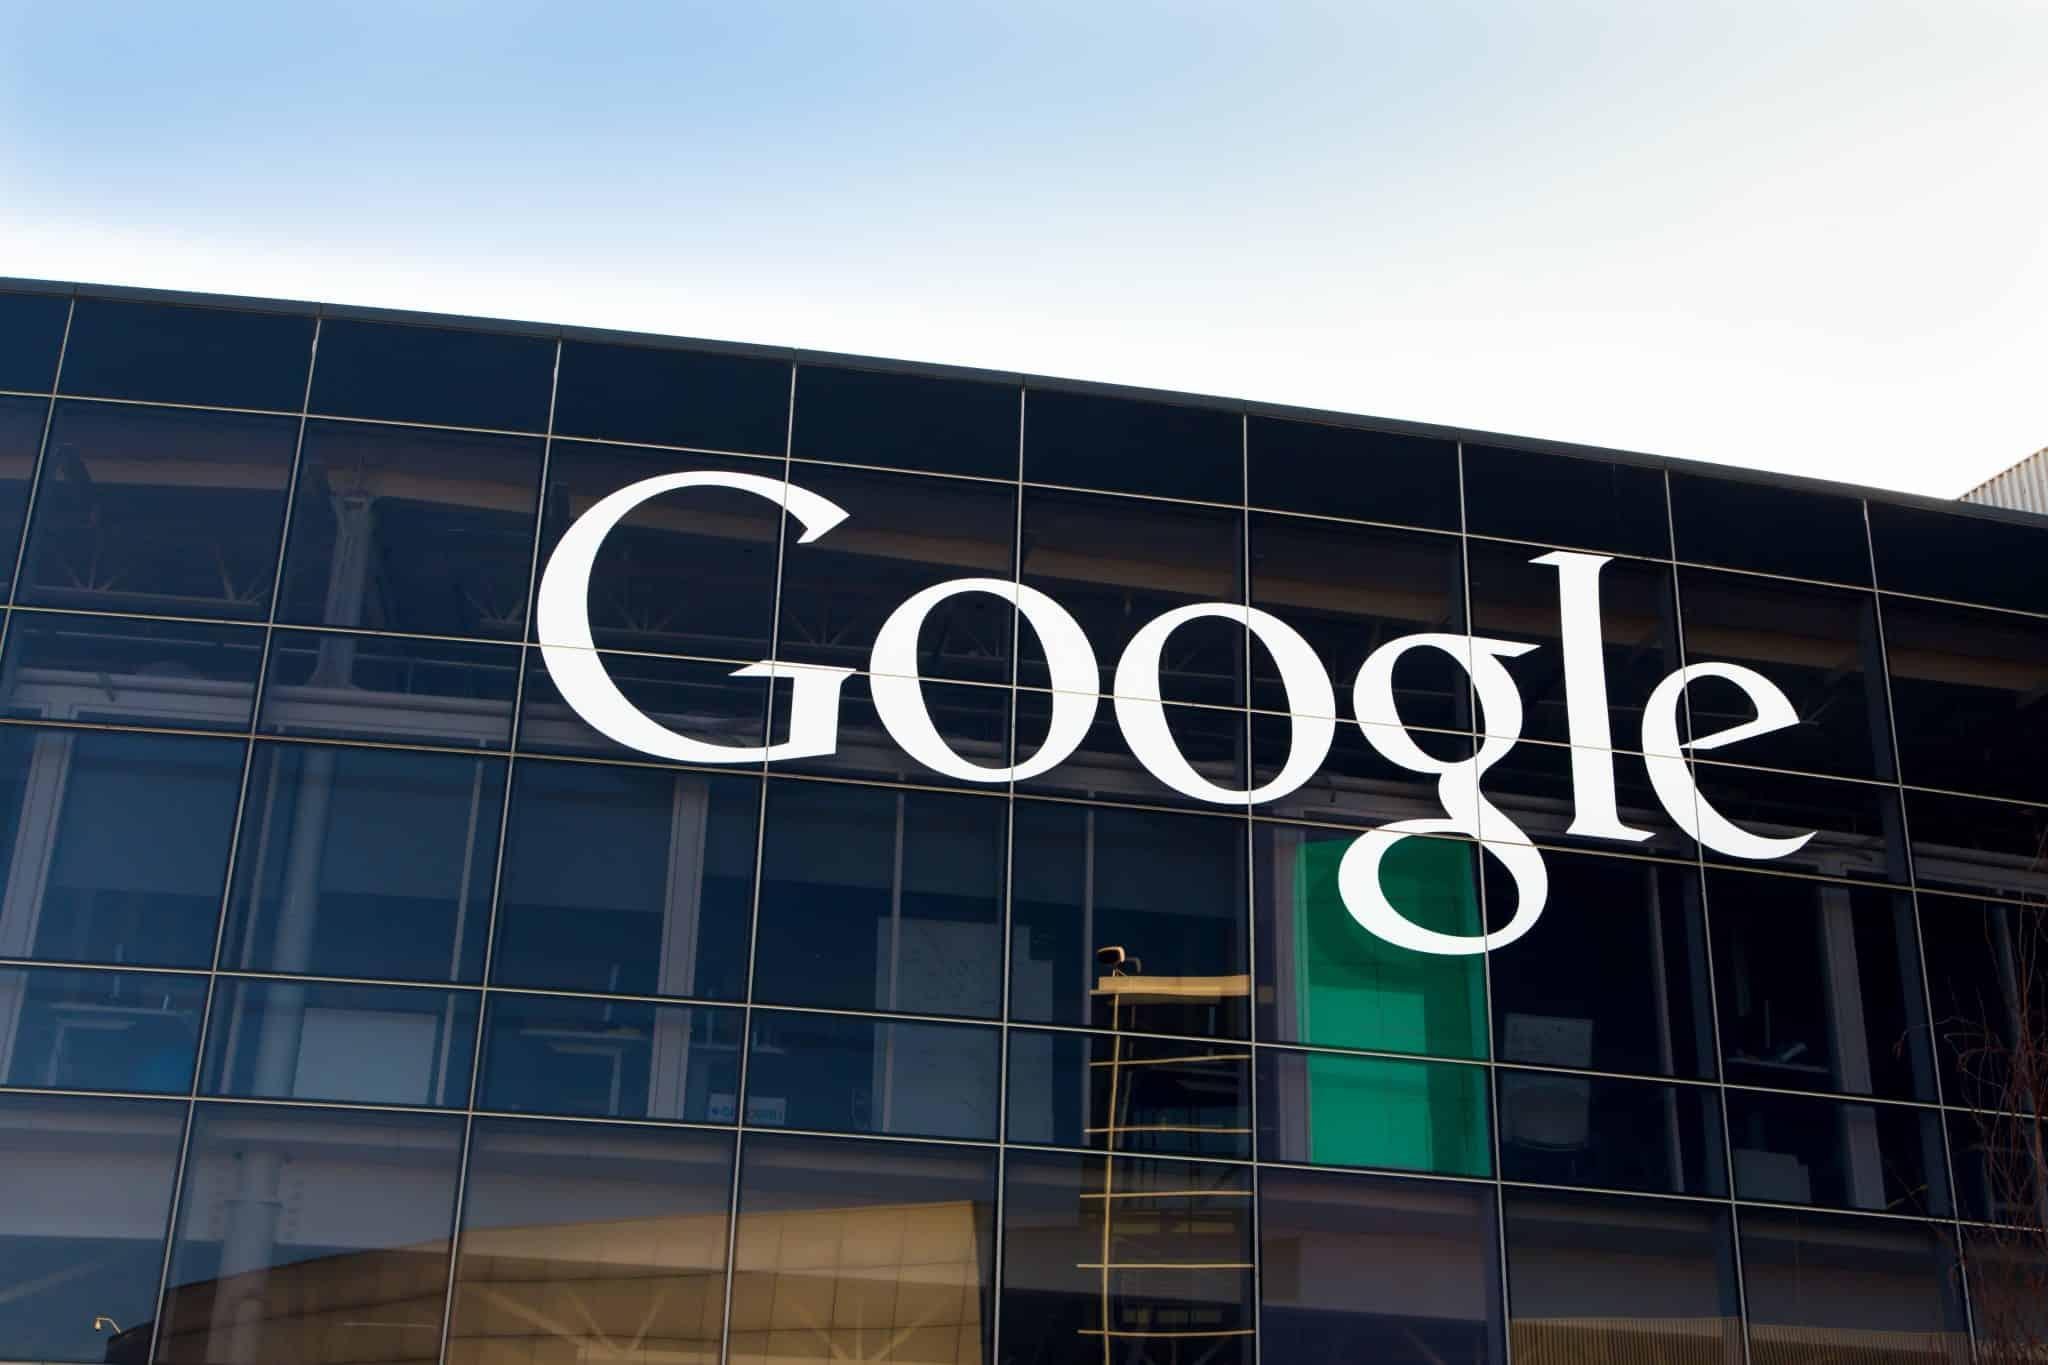 Google Corporate Headquarters and Logo